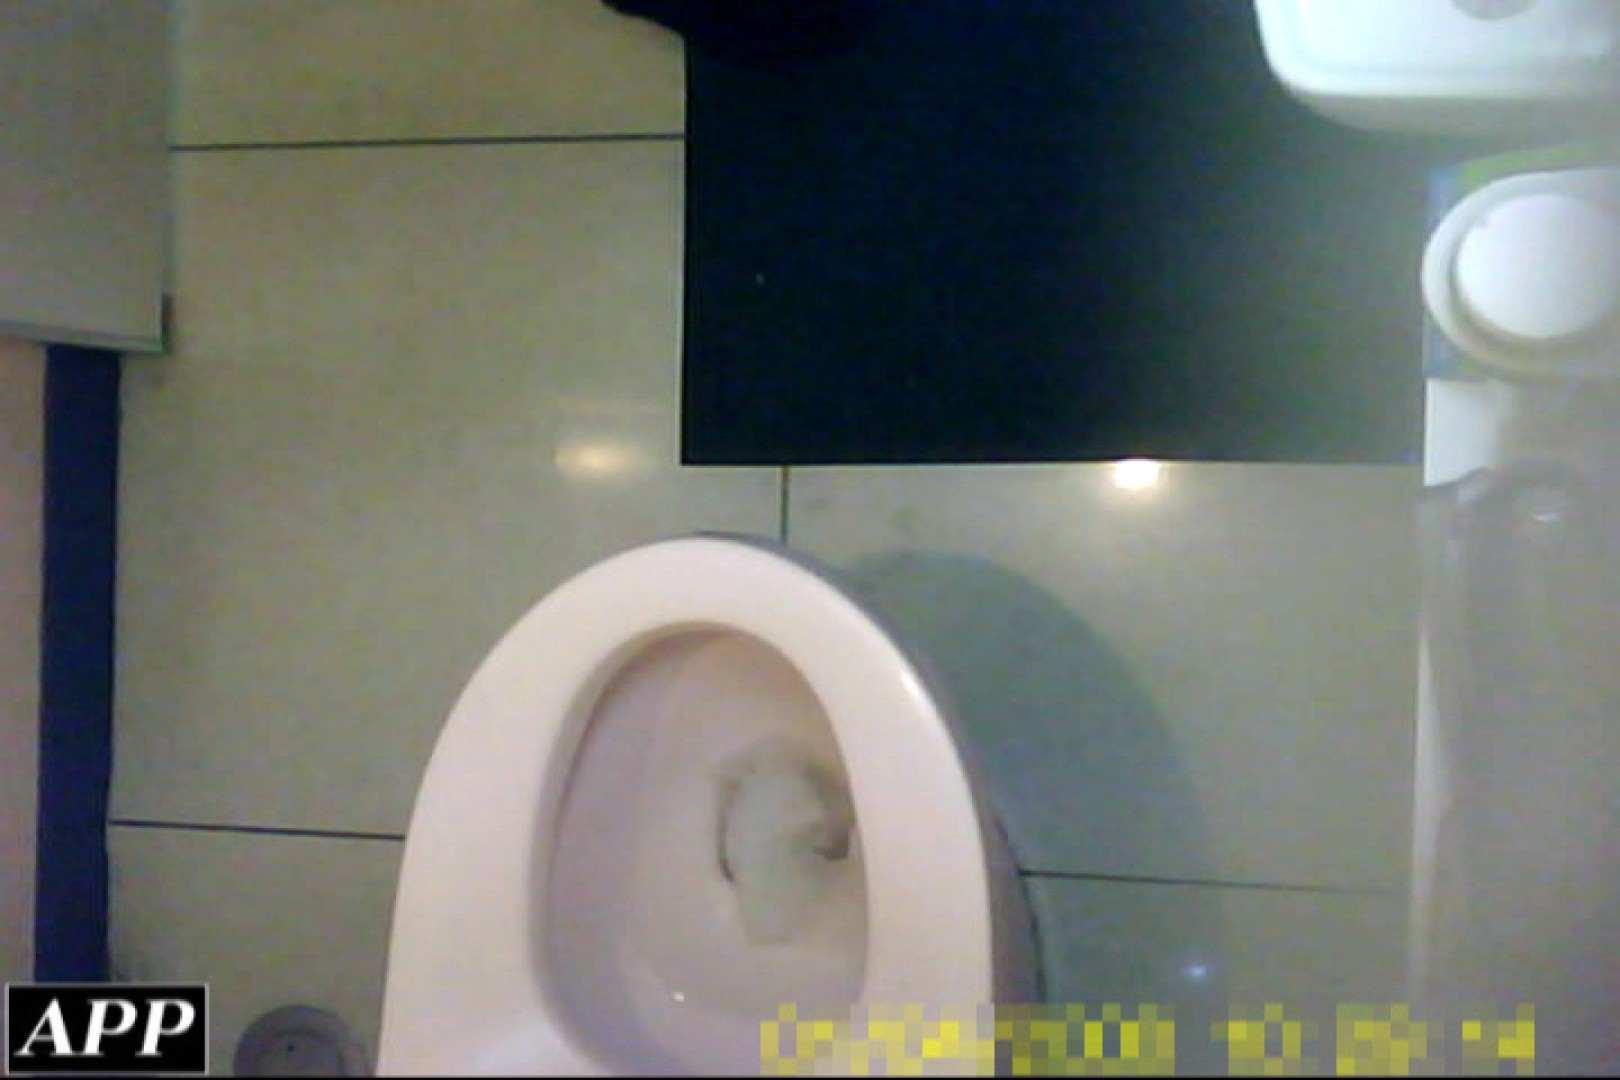 3視点洗面所 vol.080 OLセックス | 洗面所  92画像 55